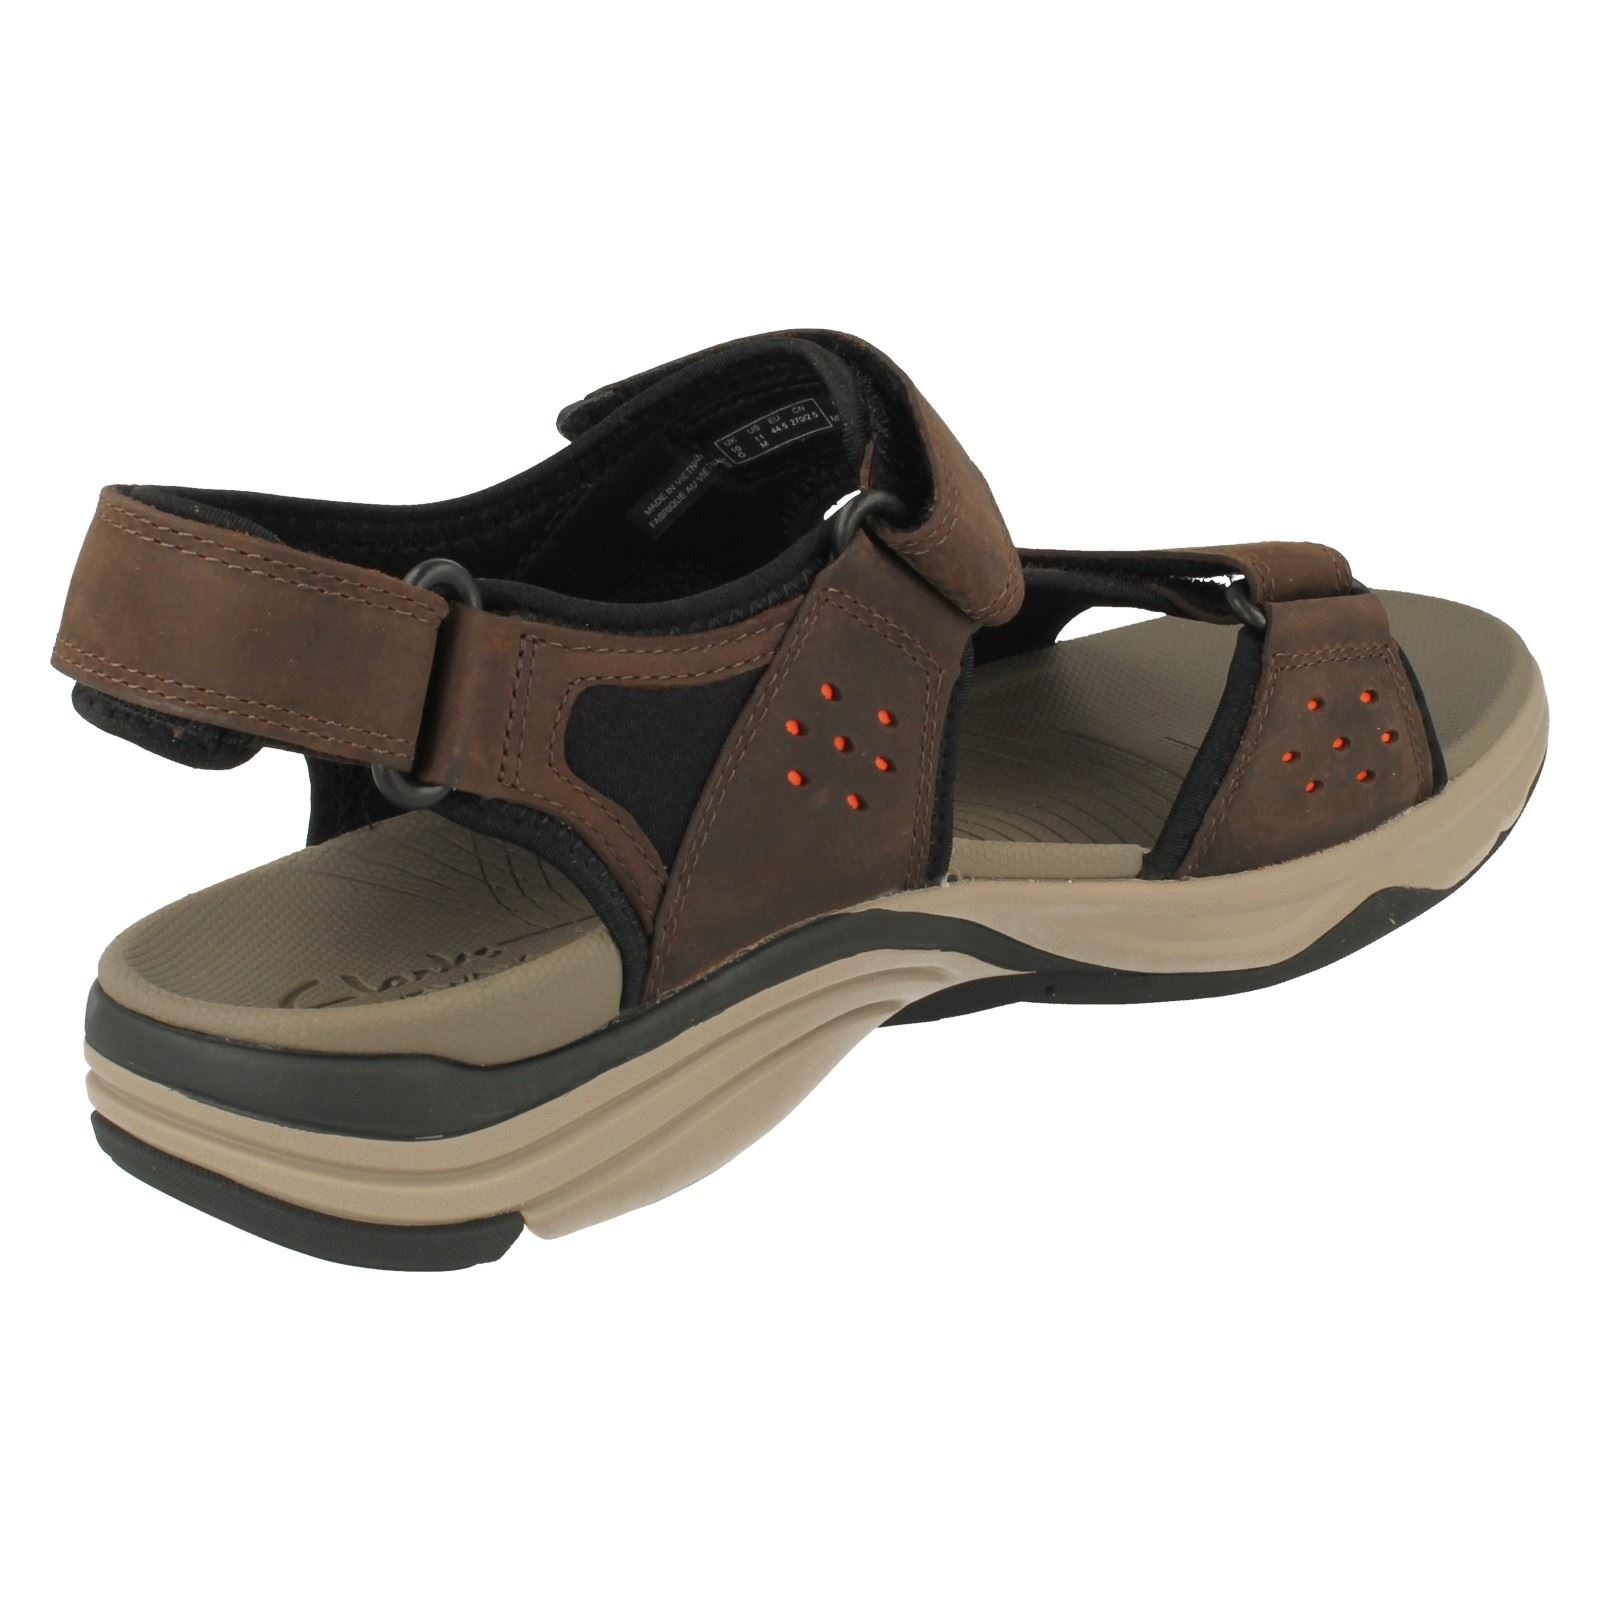 Mens Clarks Sandals Wave Leap Ebay